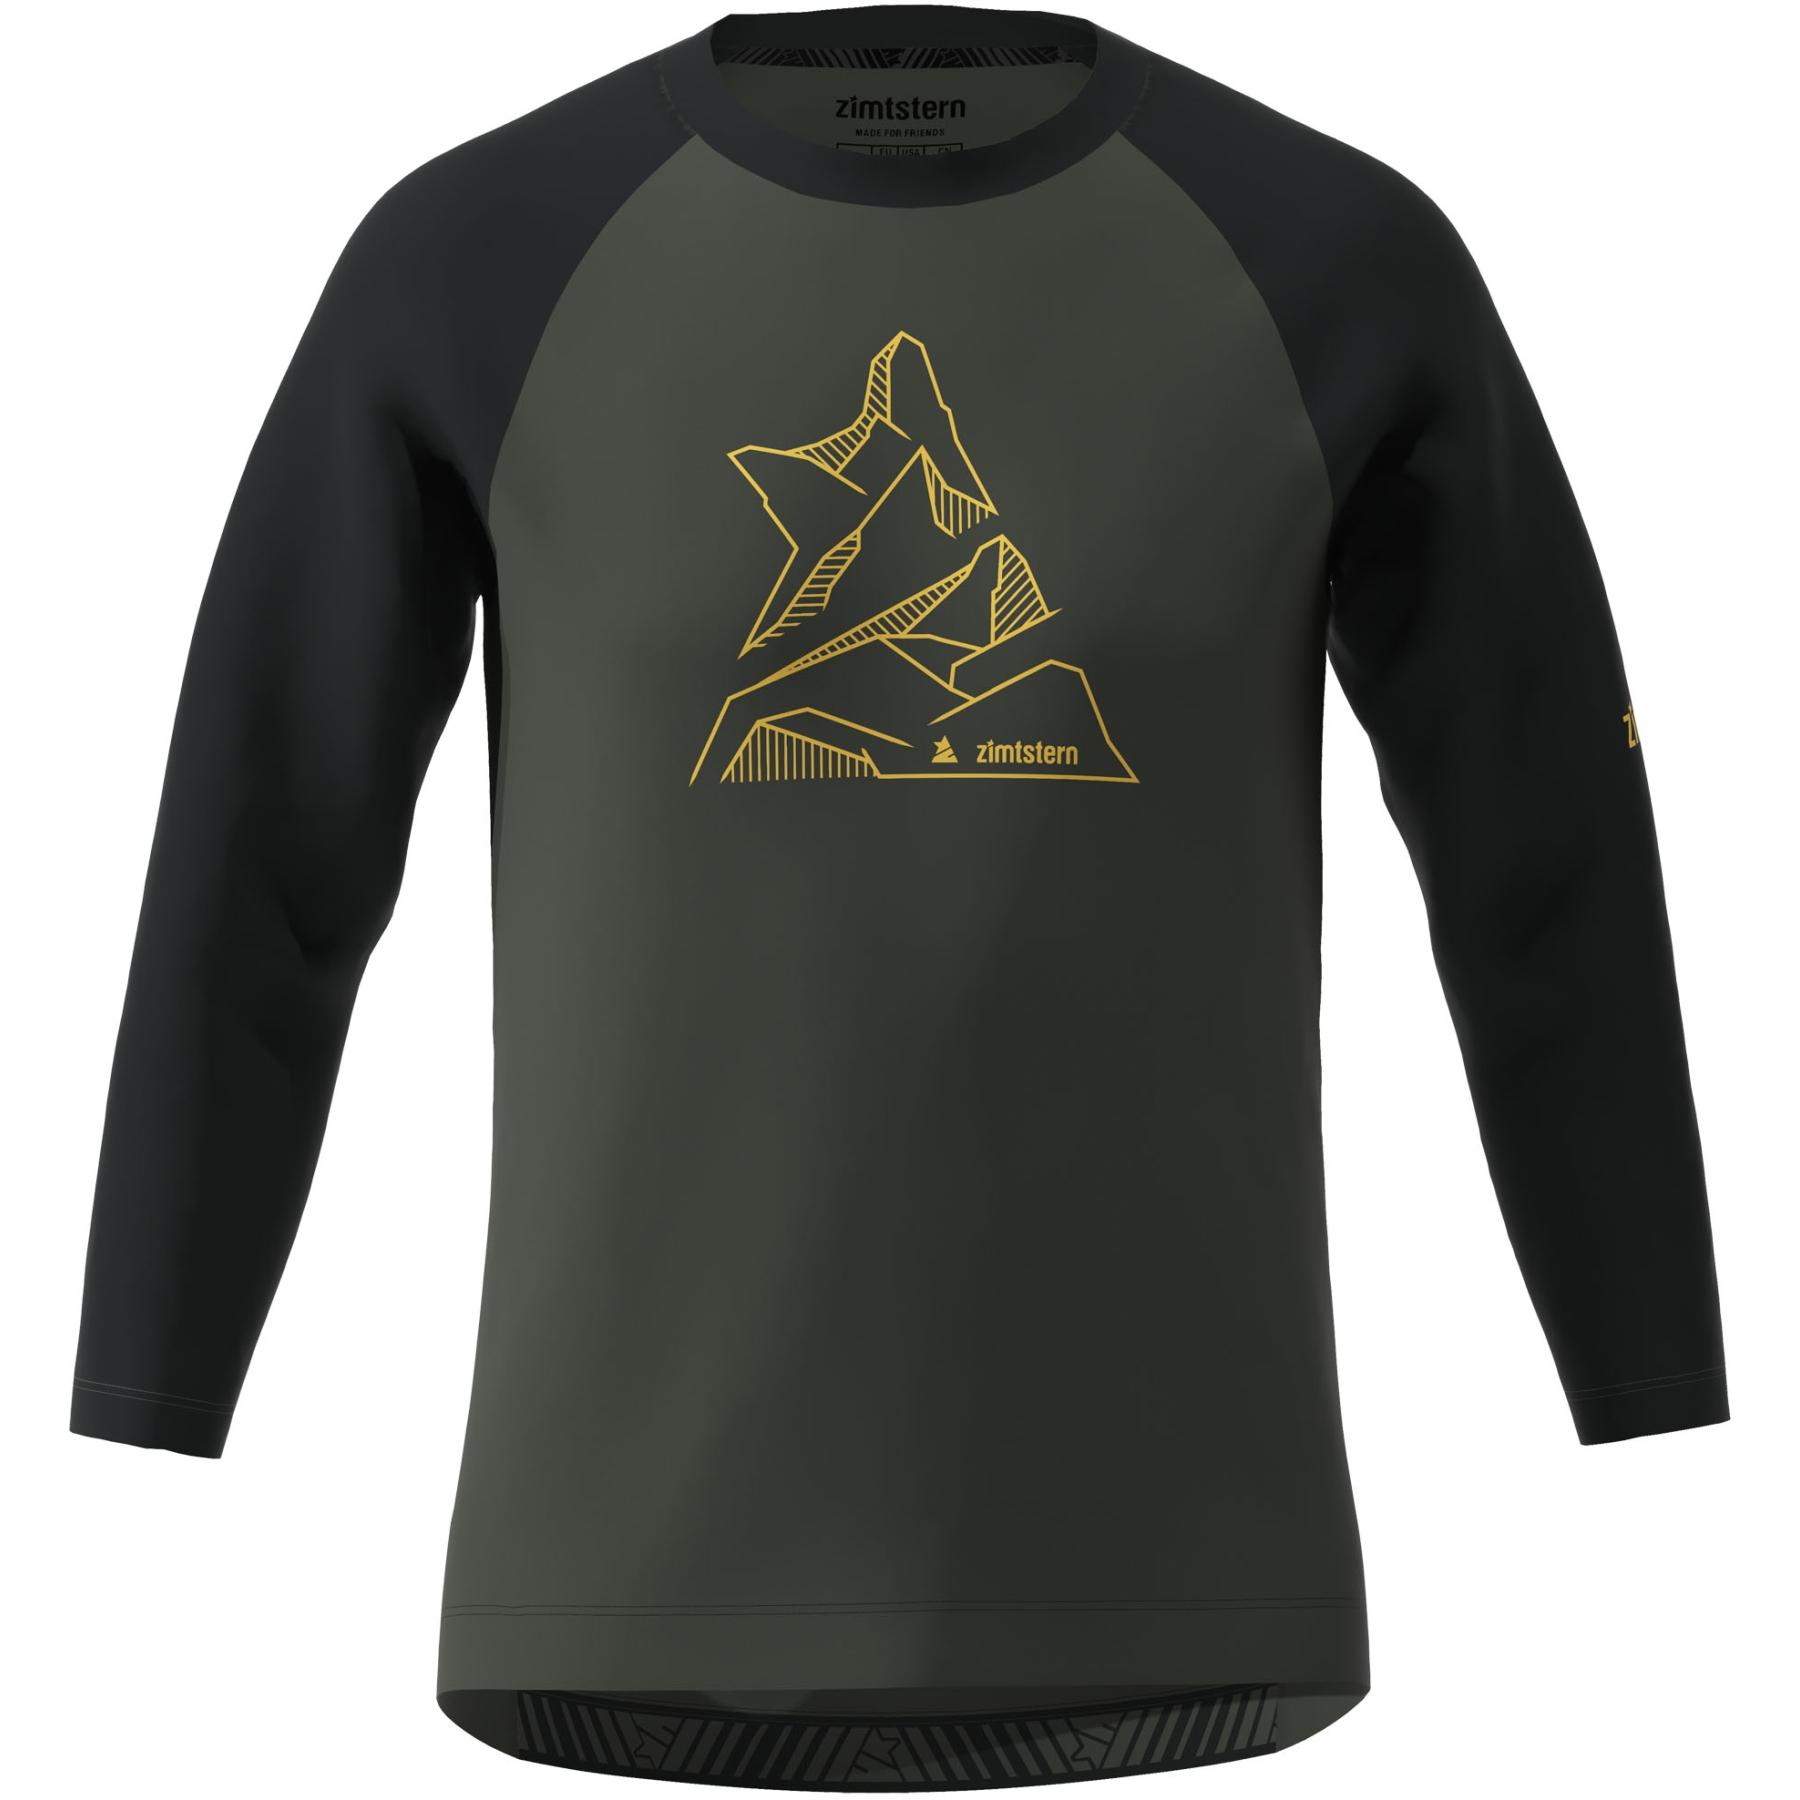 Zimtstern PureFlowz 3/4 Shirt - gun metal/pirate black